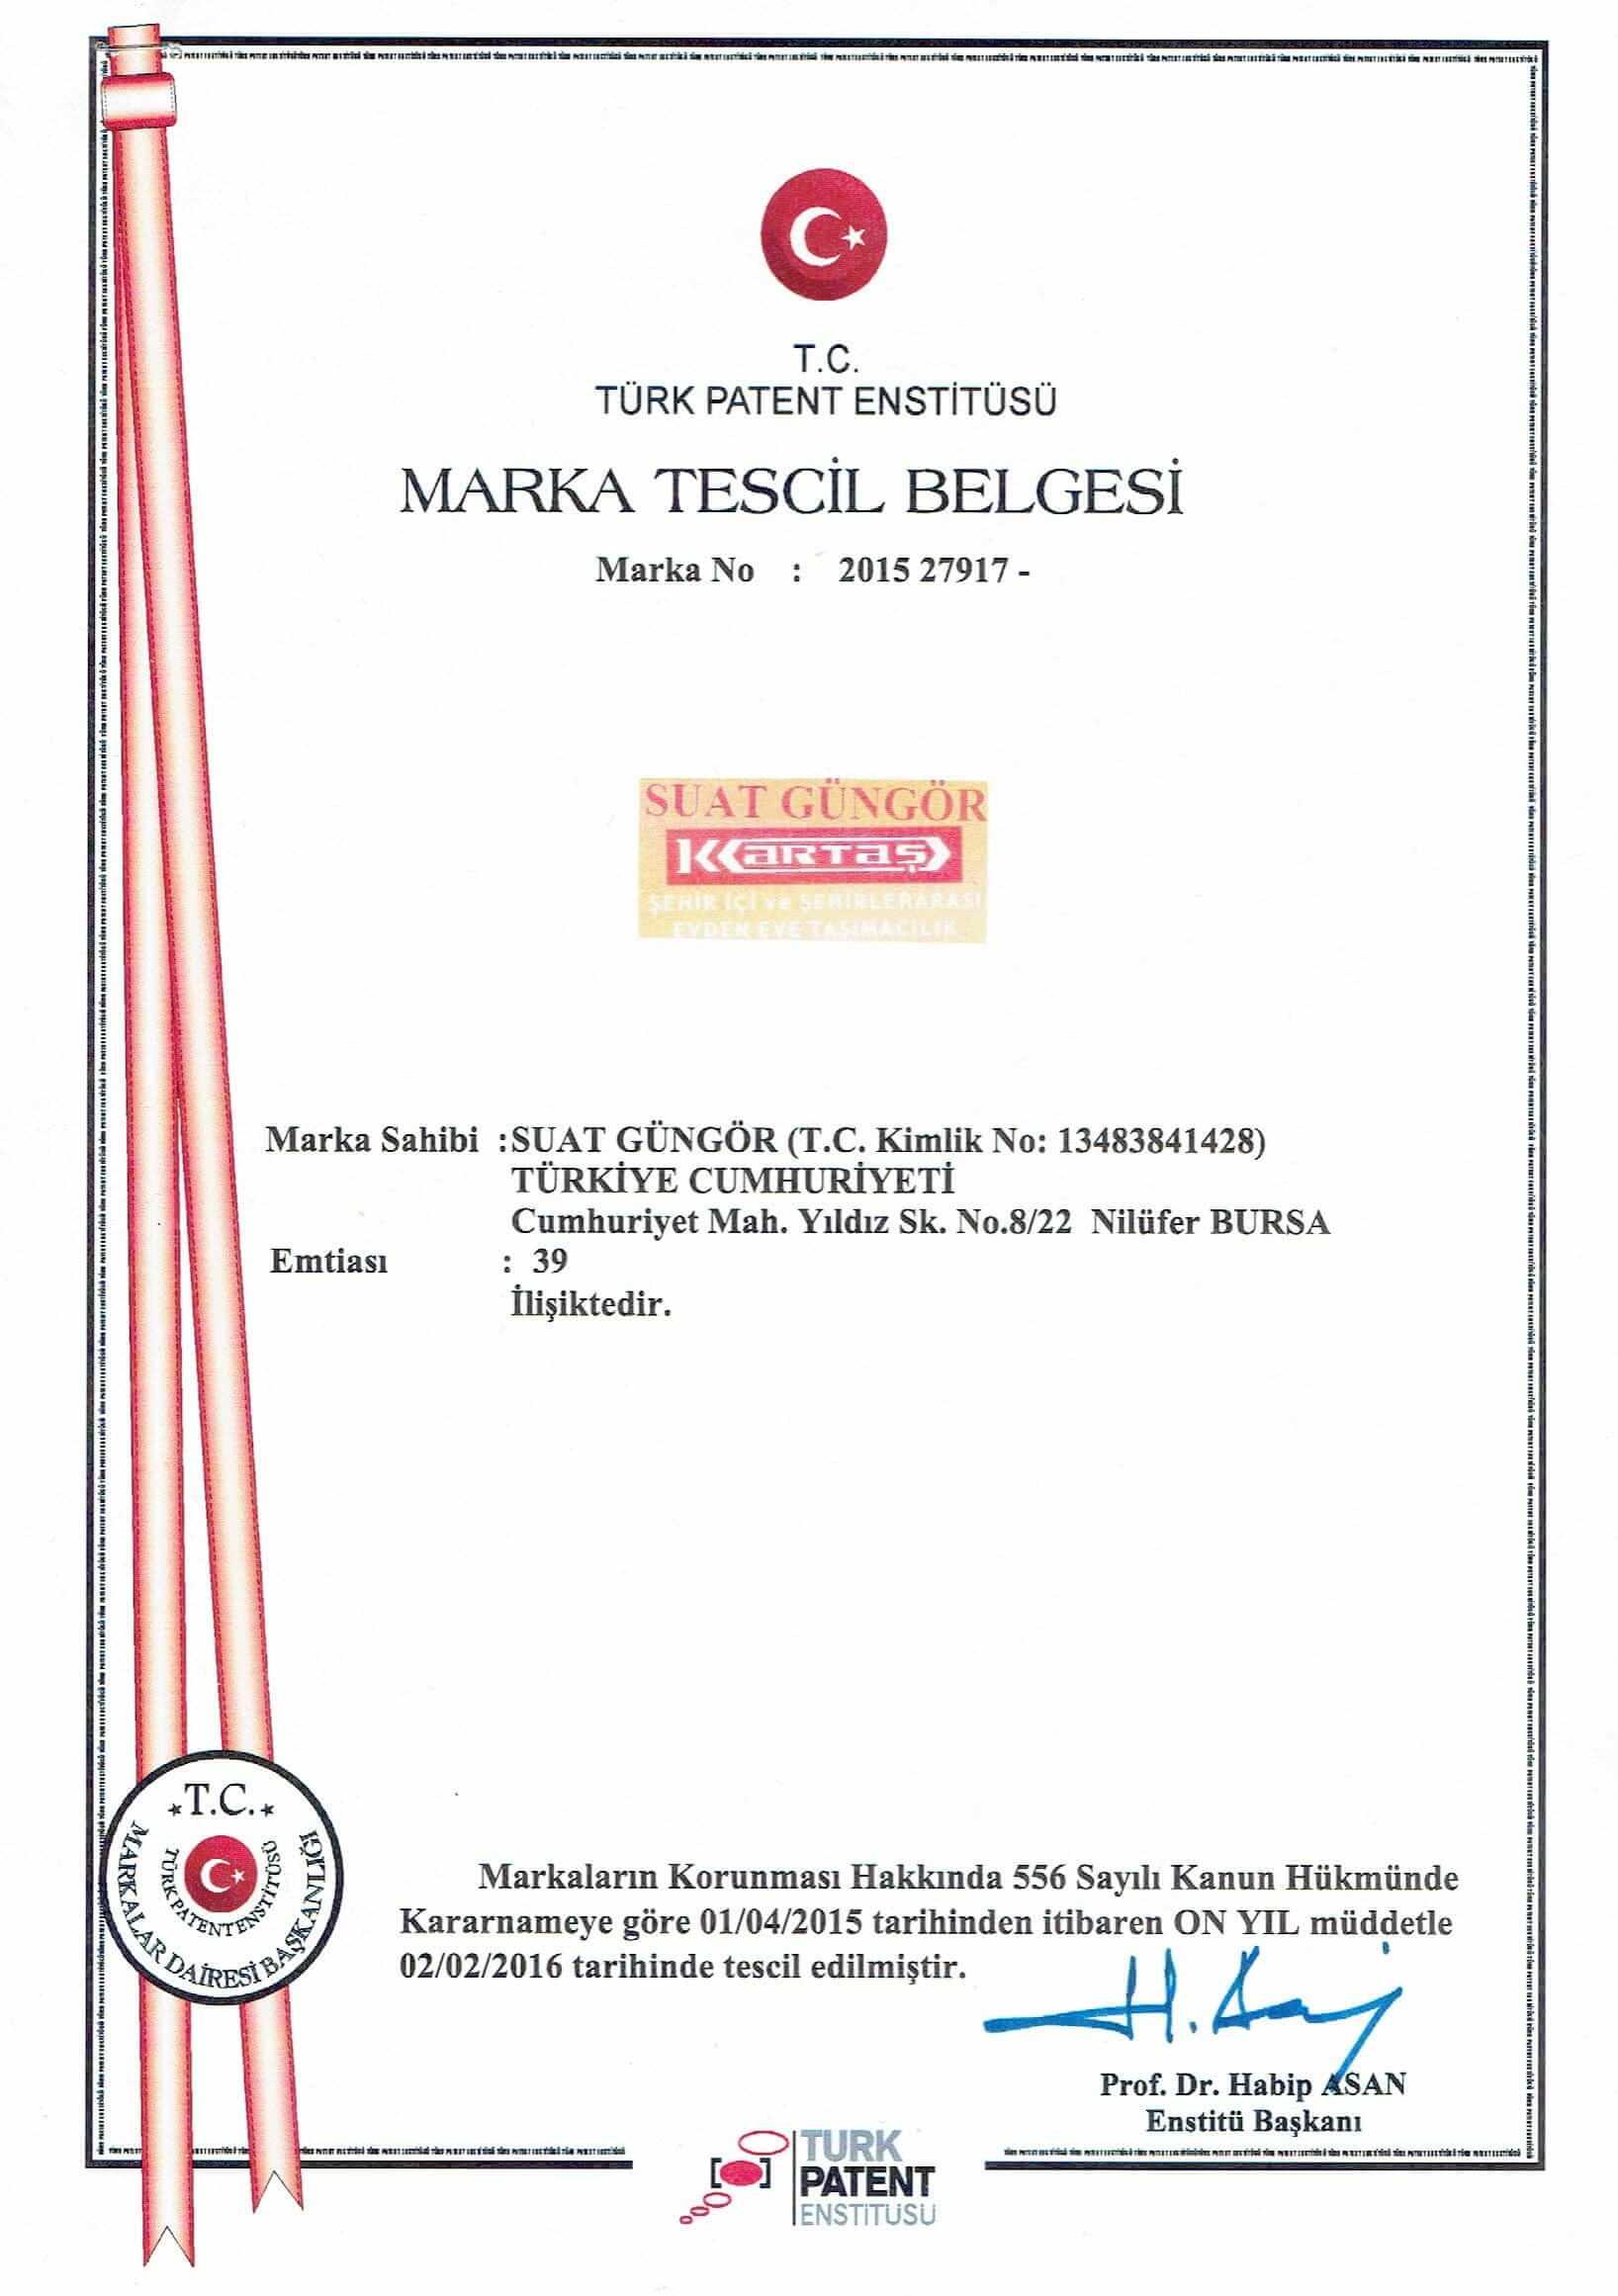 Marka Tescil Belgemiz